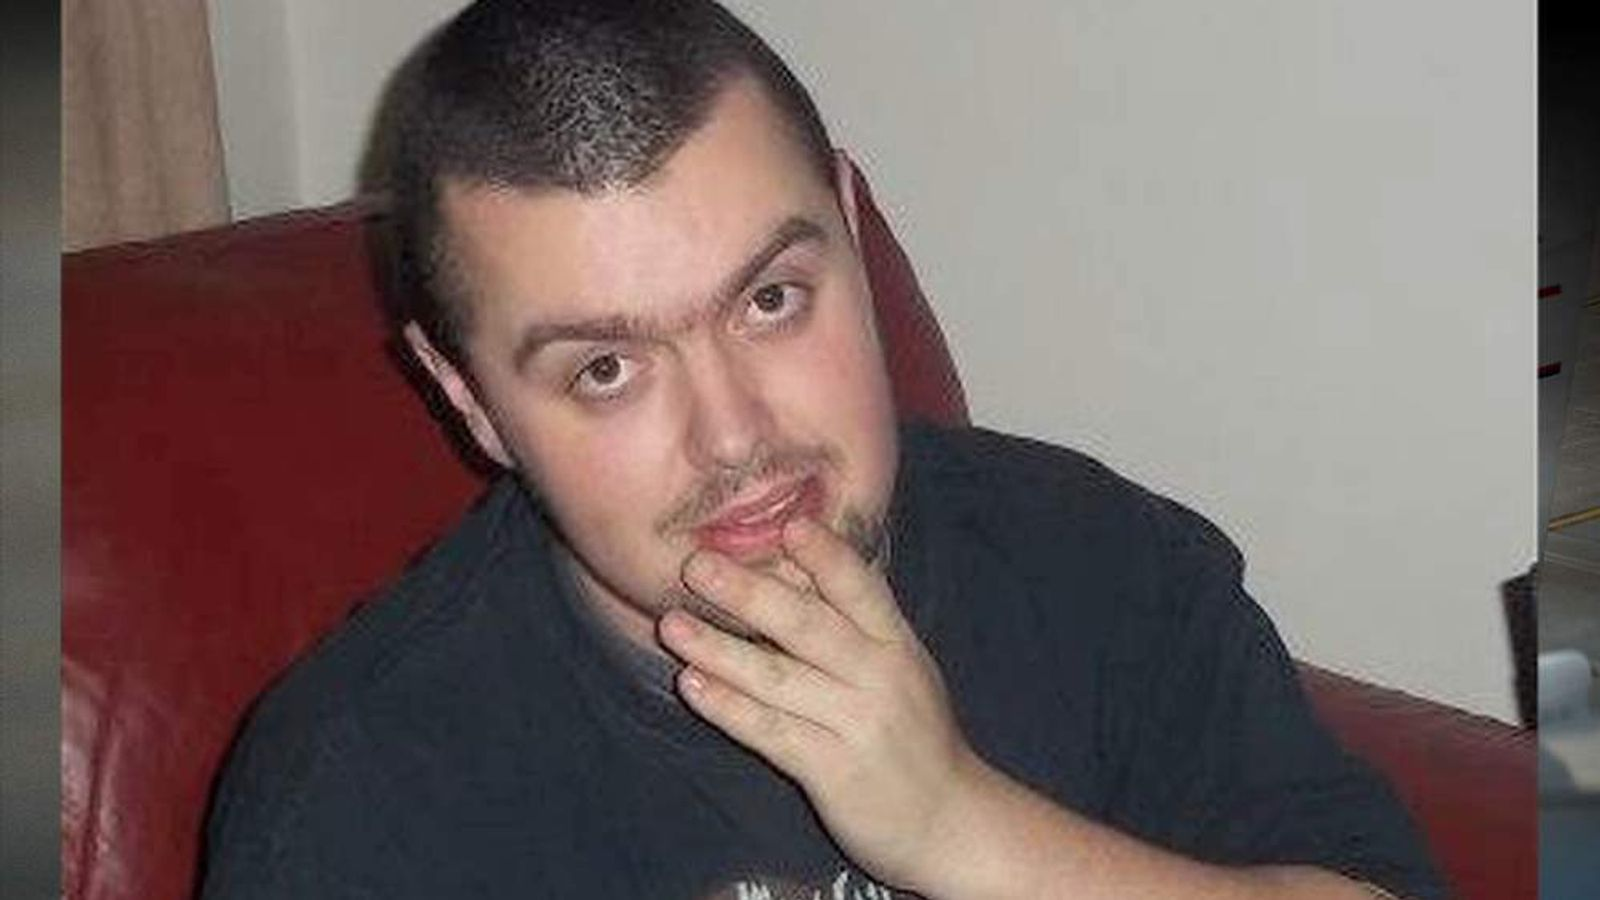 Newcastle fan Liam Sweeney, who was killed when MH17 was shot down